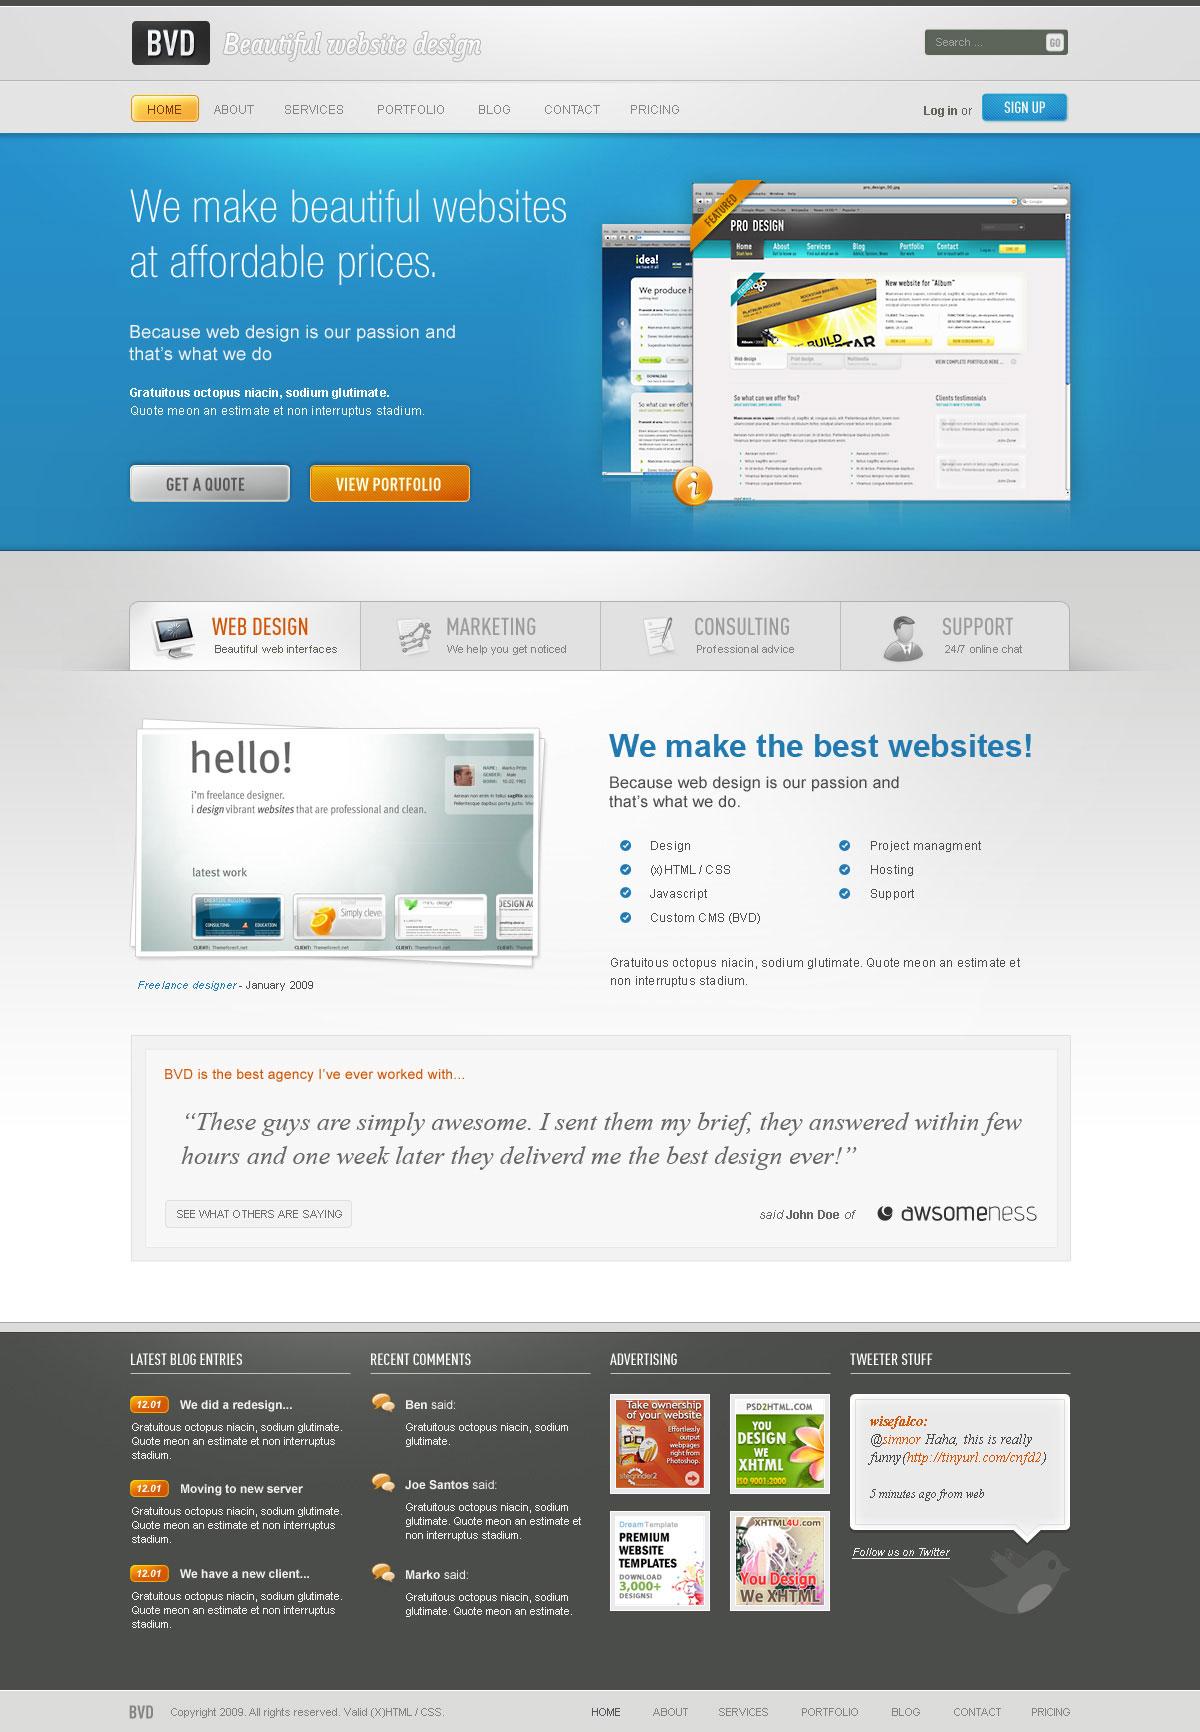 BVD - Beautiful Website Design